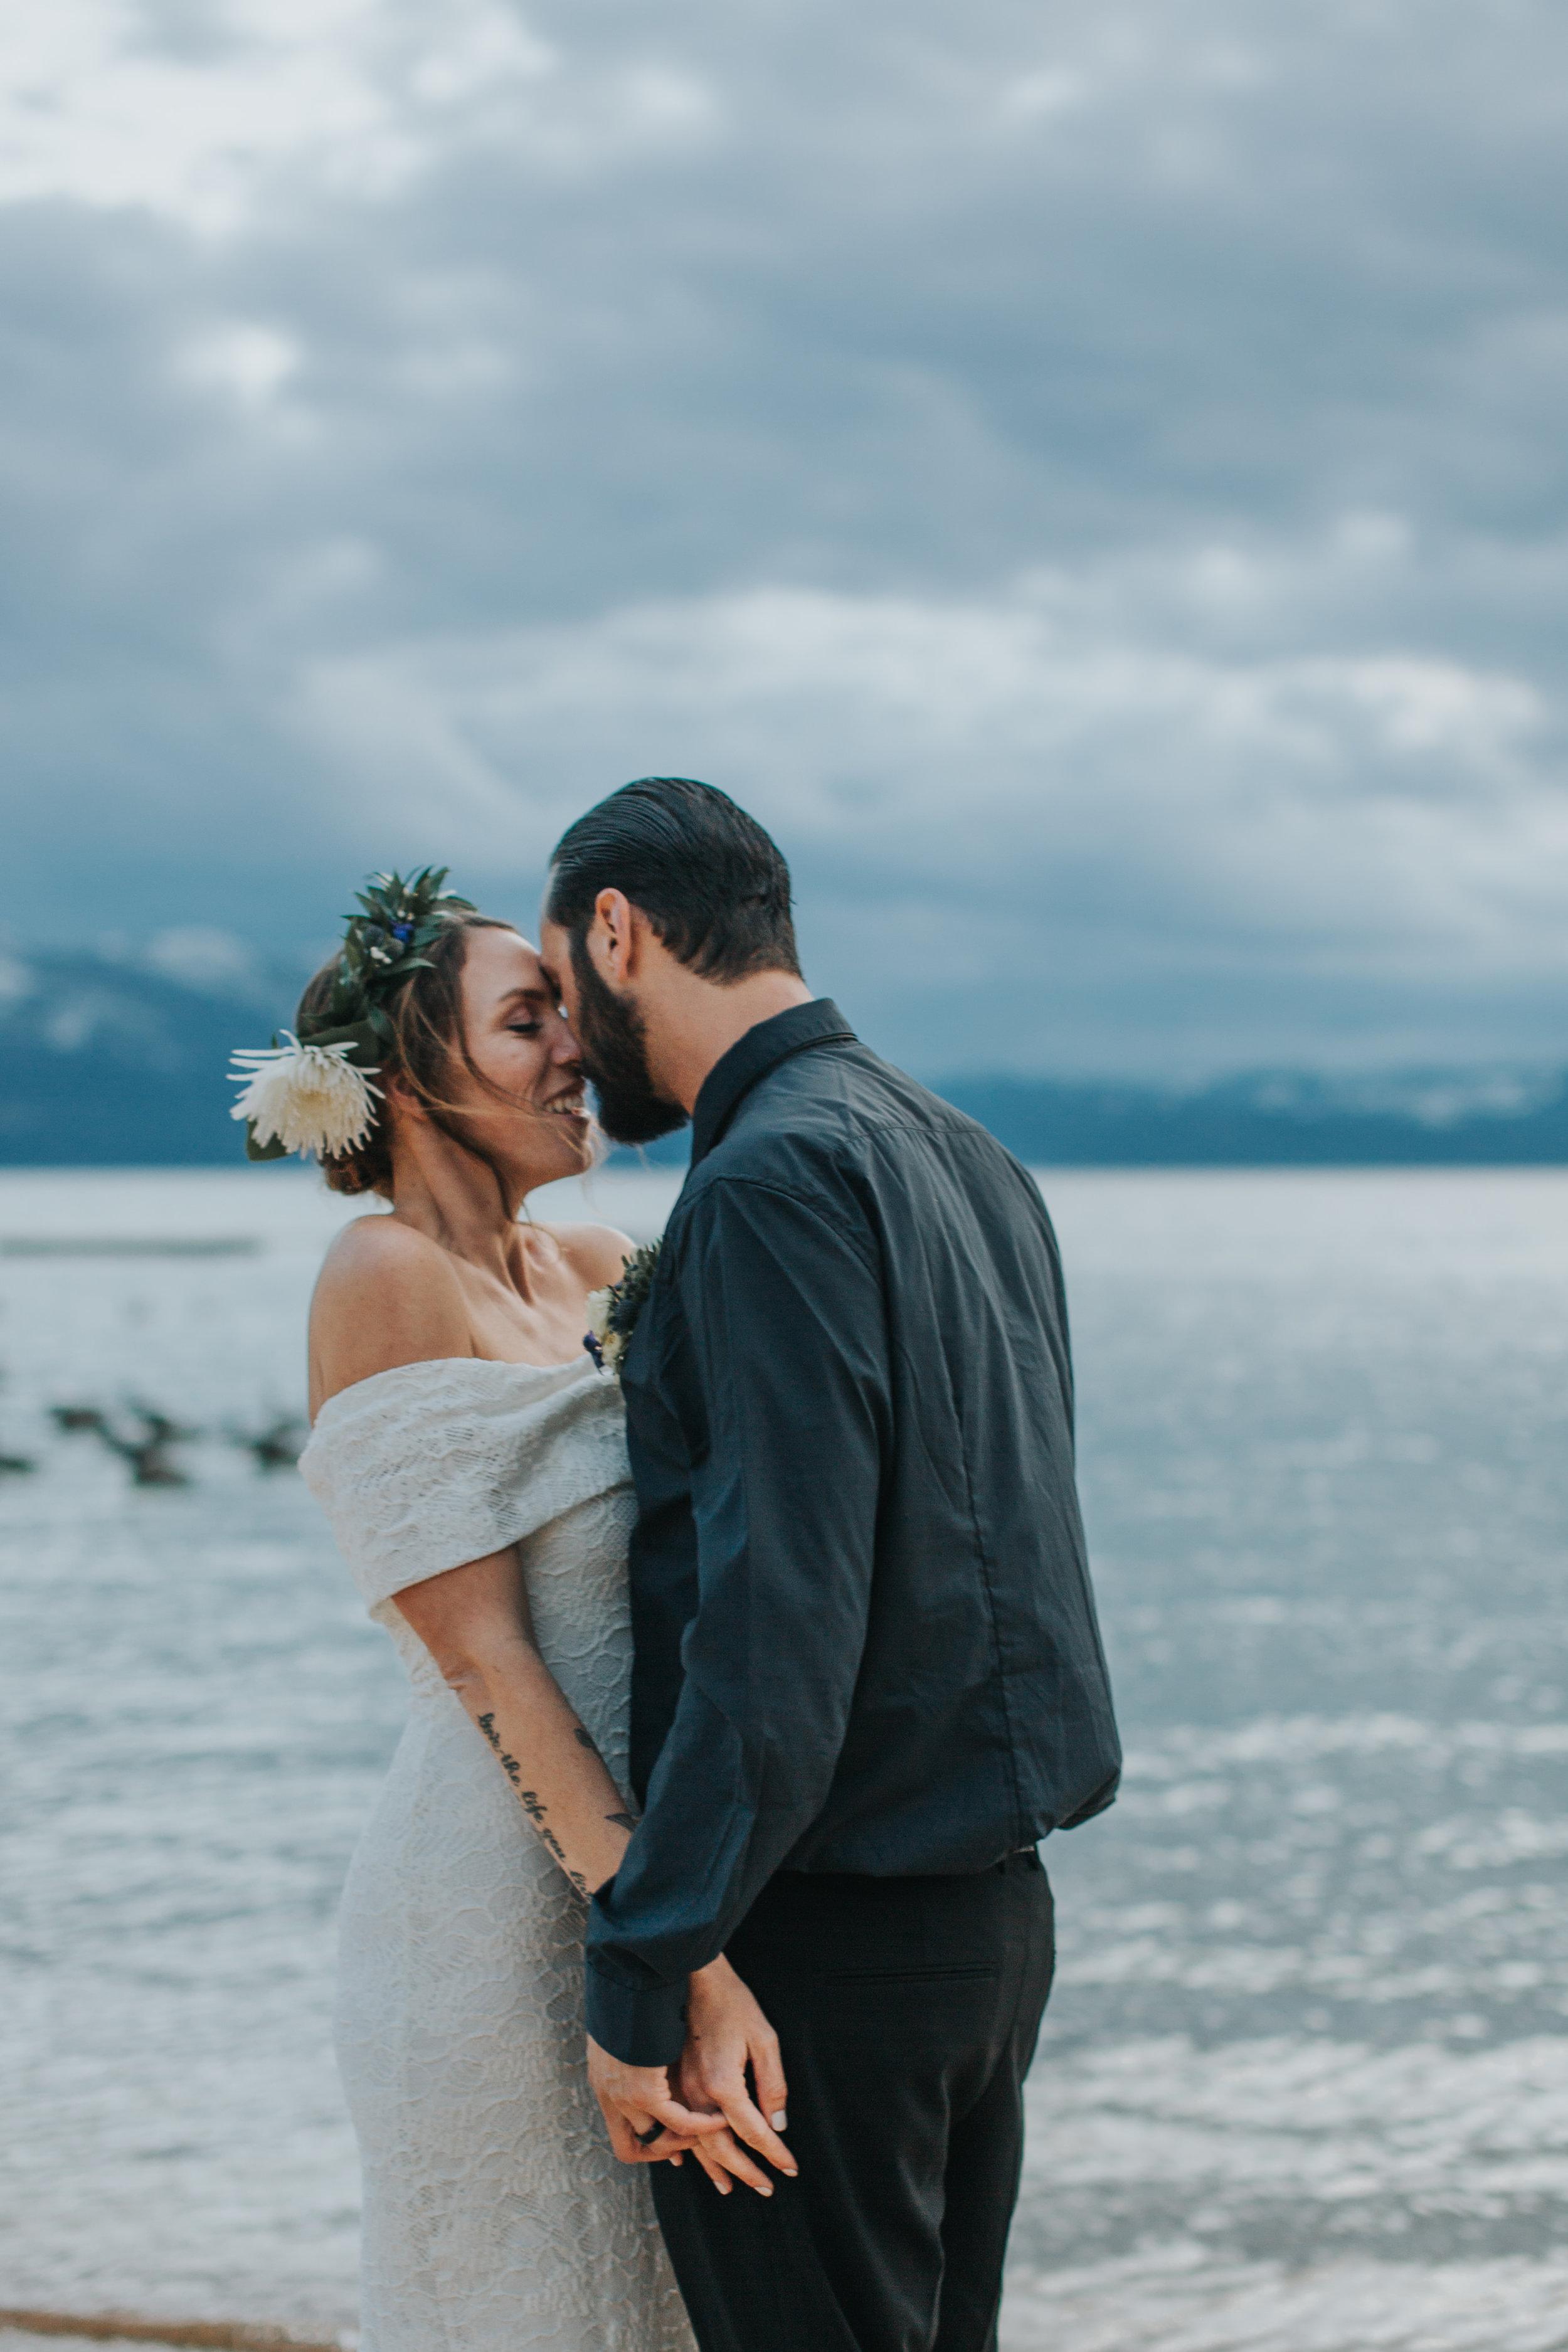 south-lake-tahoe-elopement-valerie-lendvay-photo-060.jpg